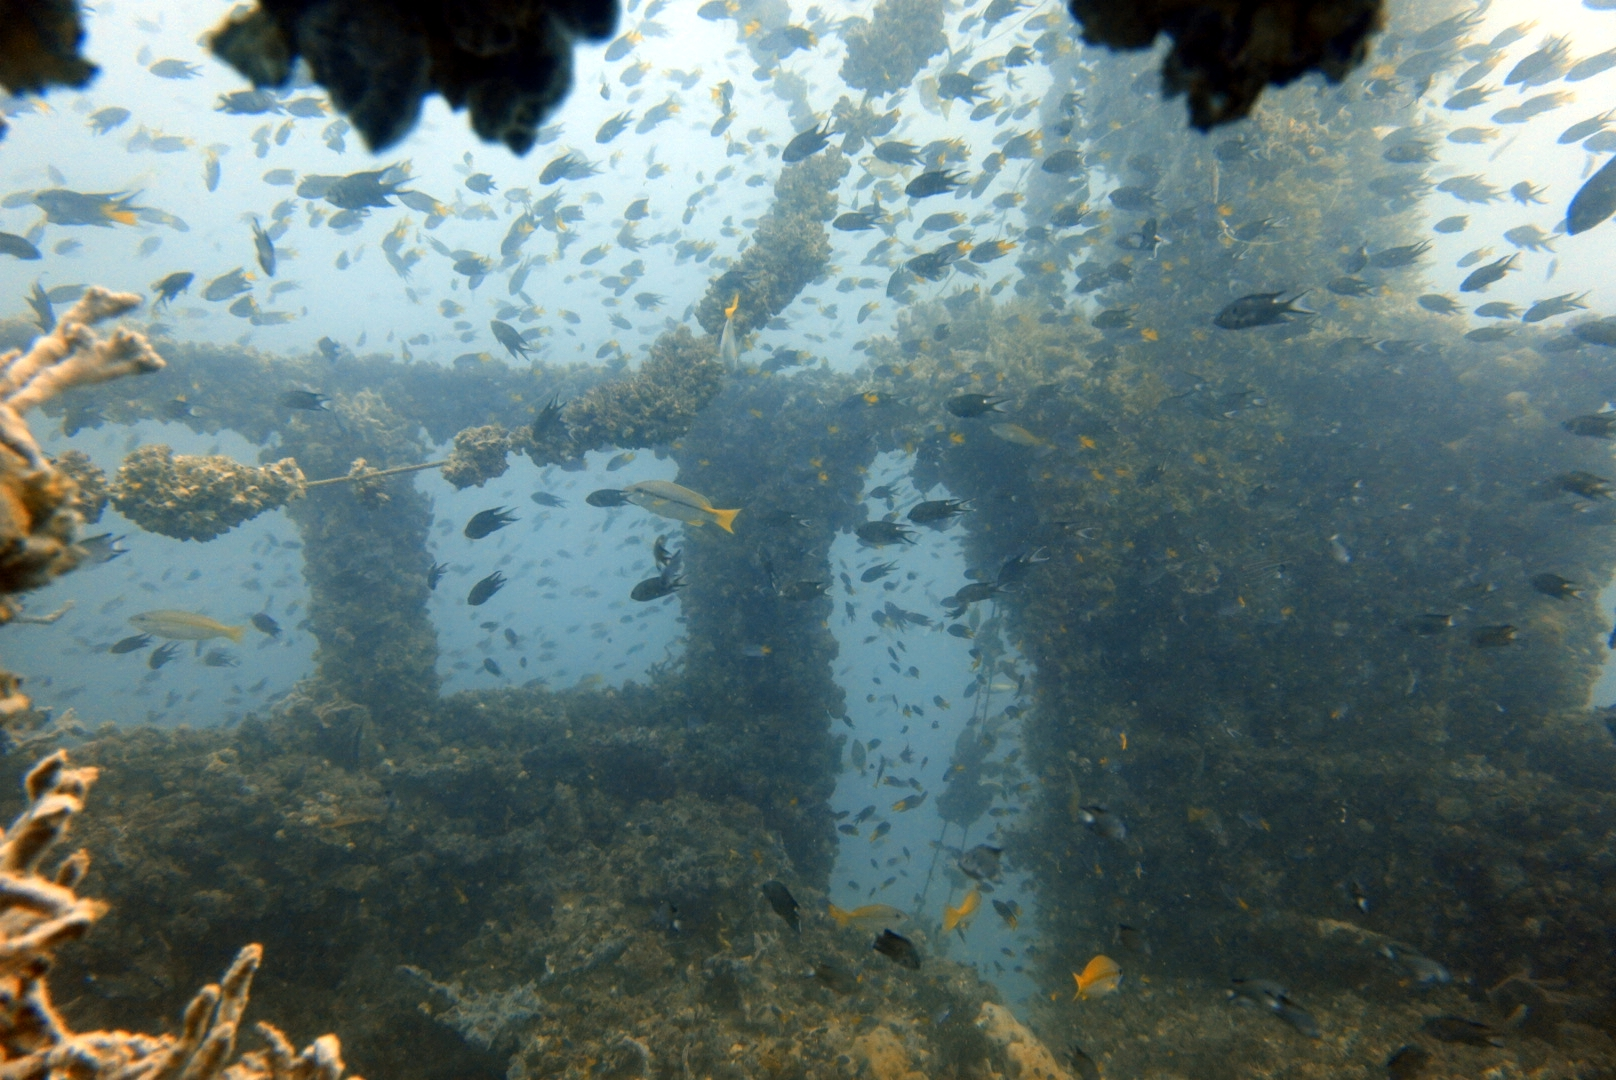 Scuba Diving Pattaya Thailand www.real-divers.com